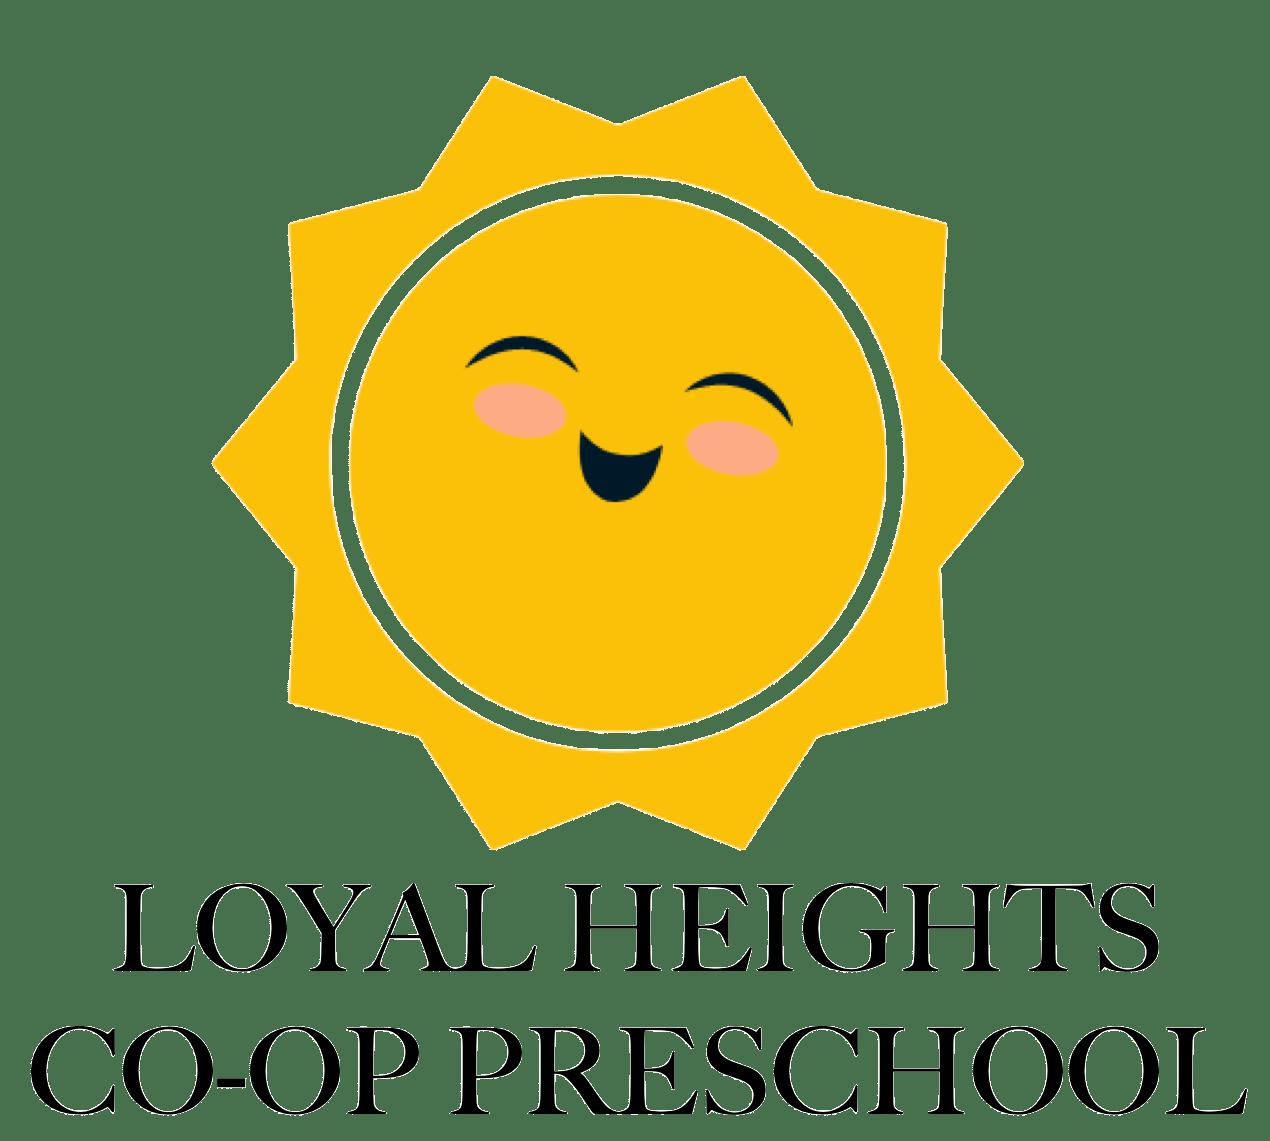 Loyal Heights Cooperative Preschool